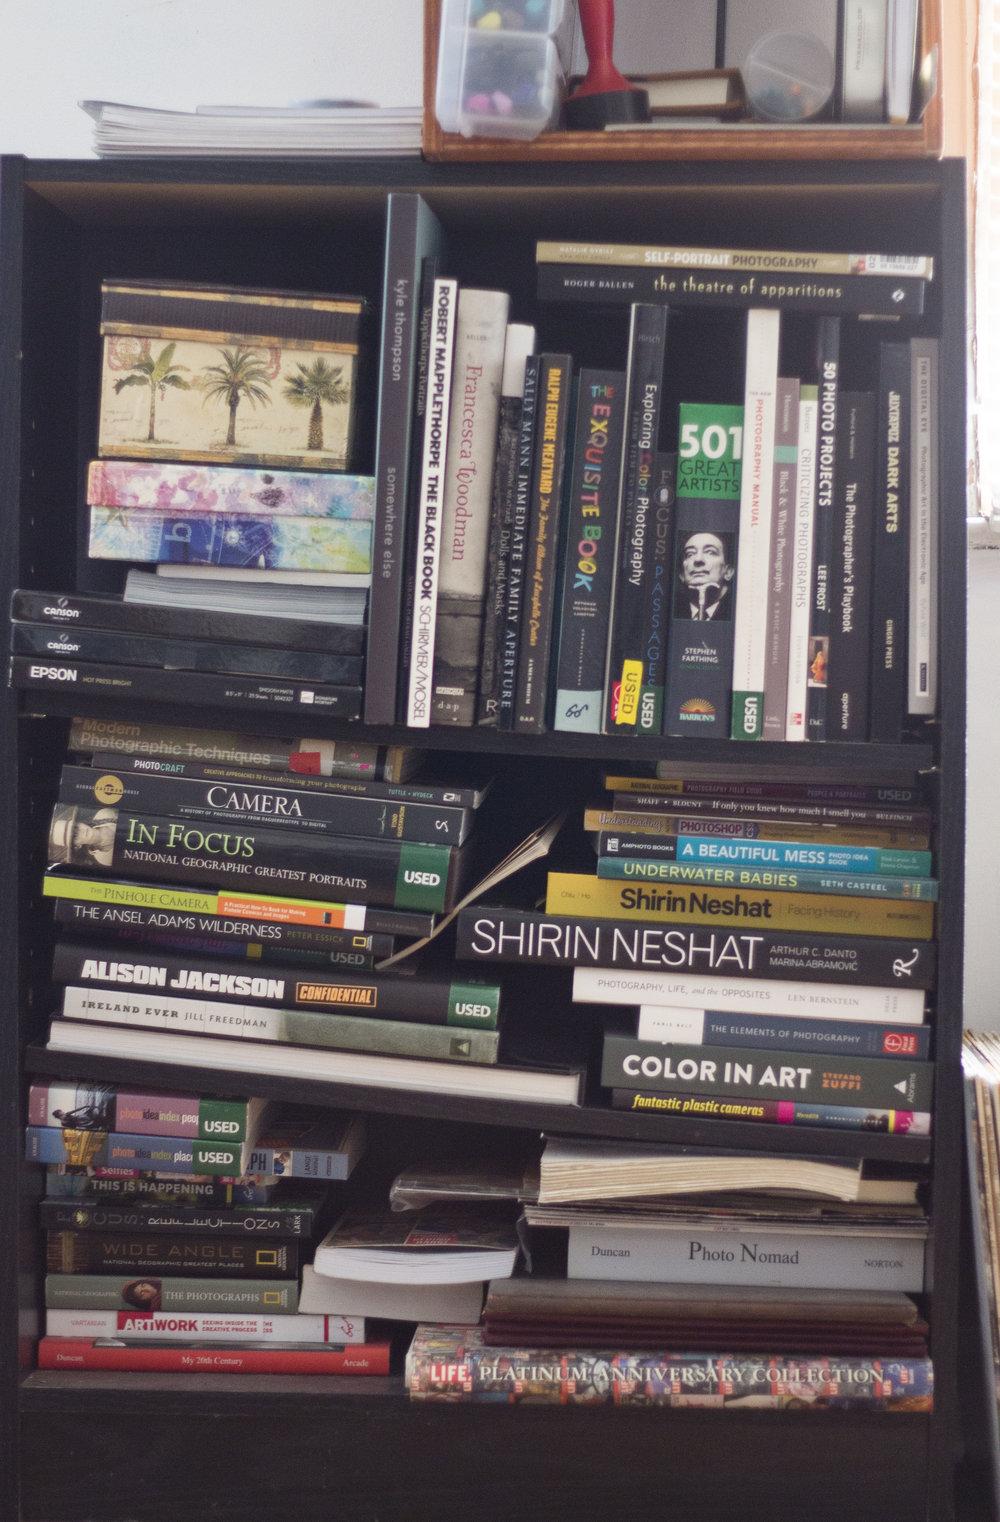 Etta Martin's precarious photobook piles.